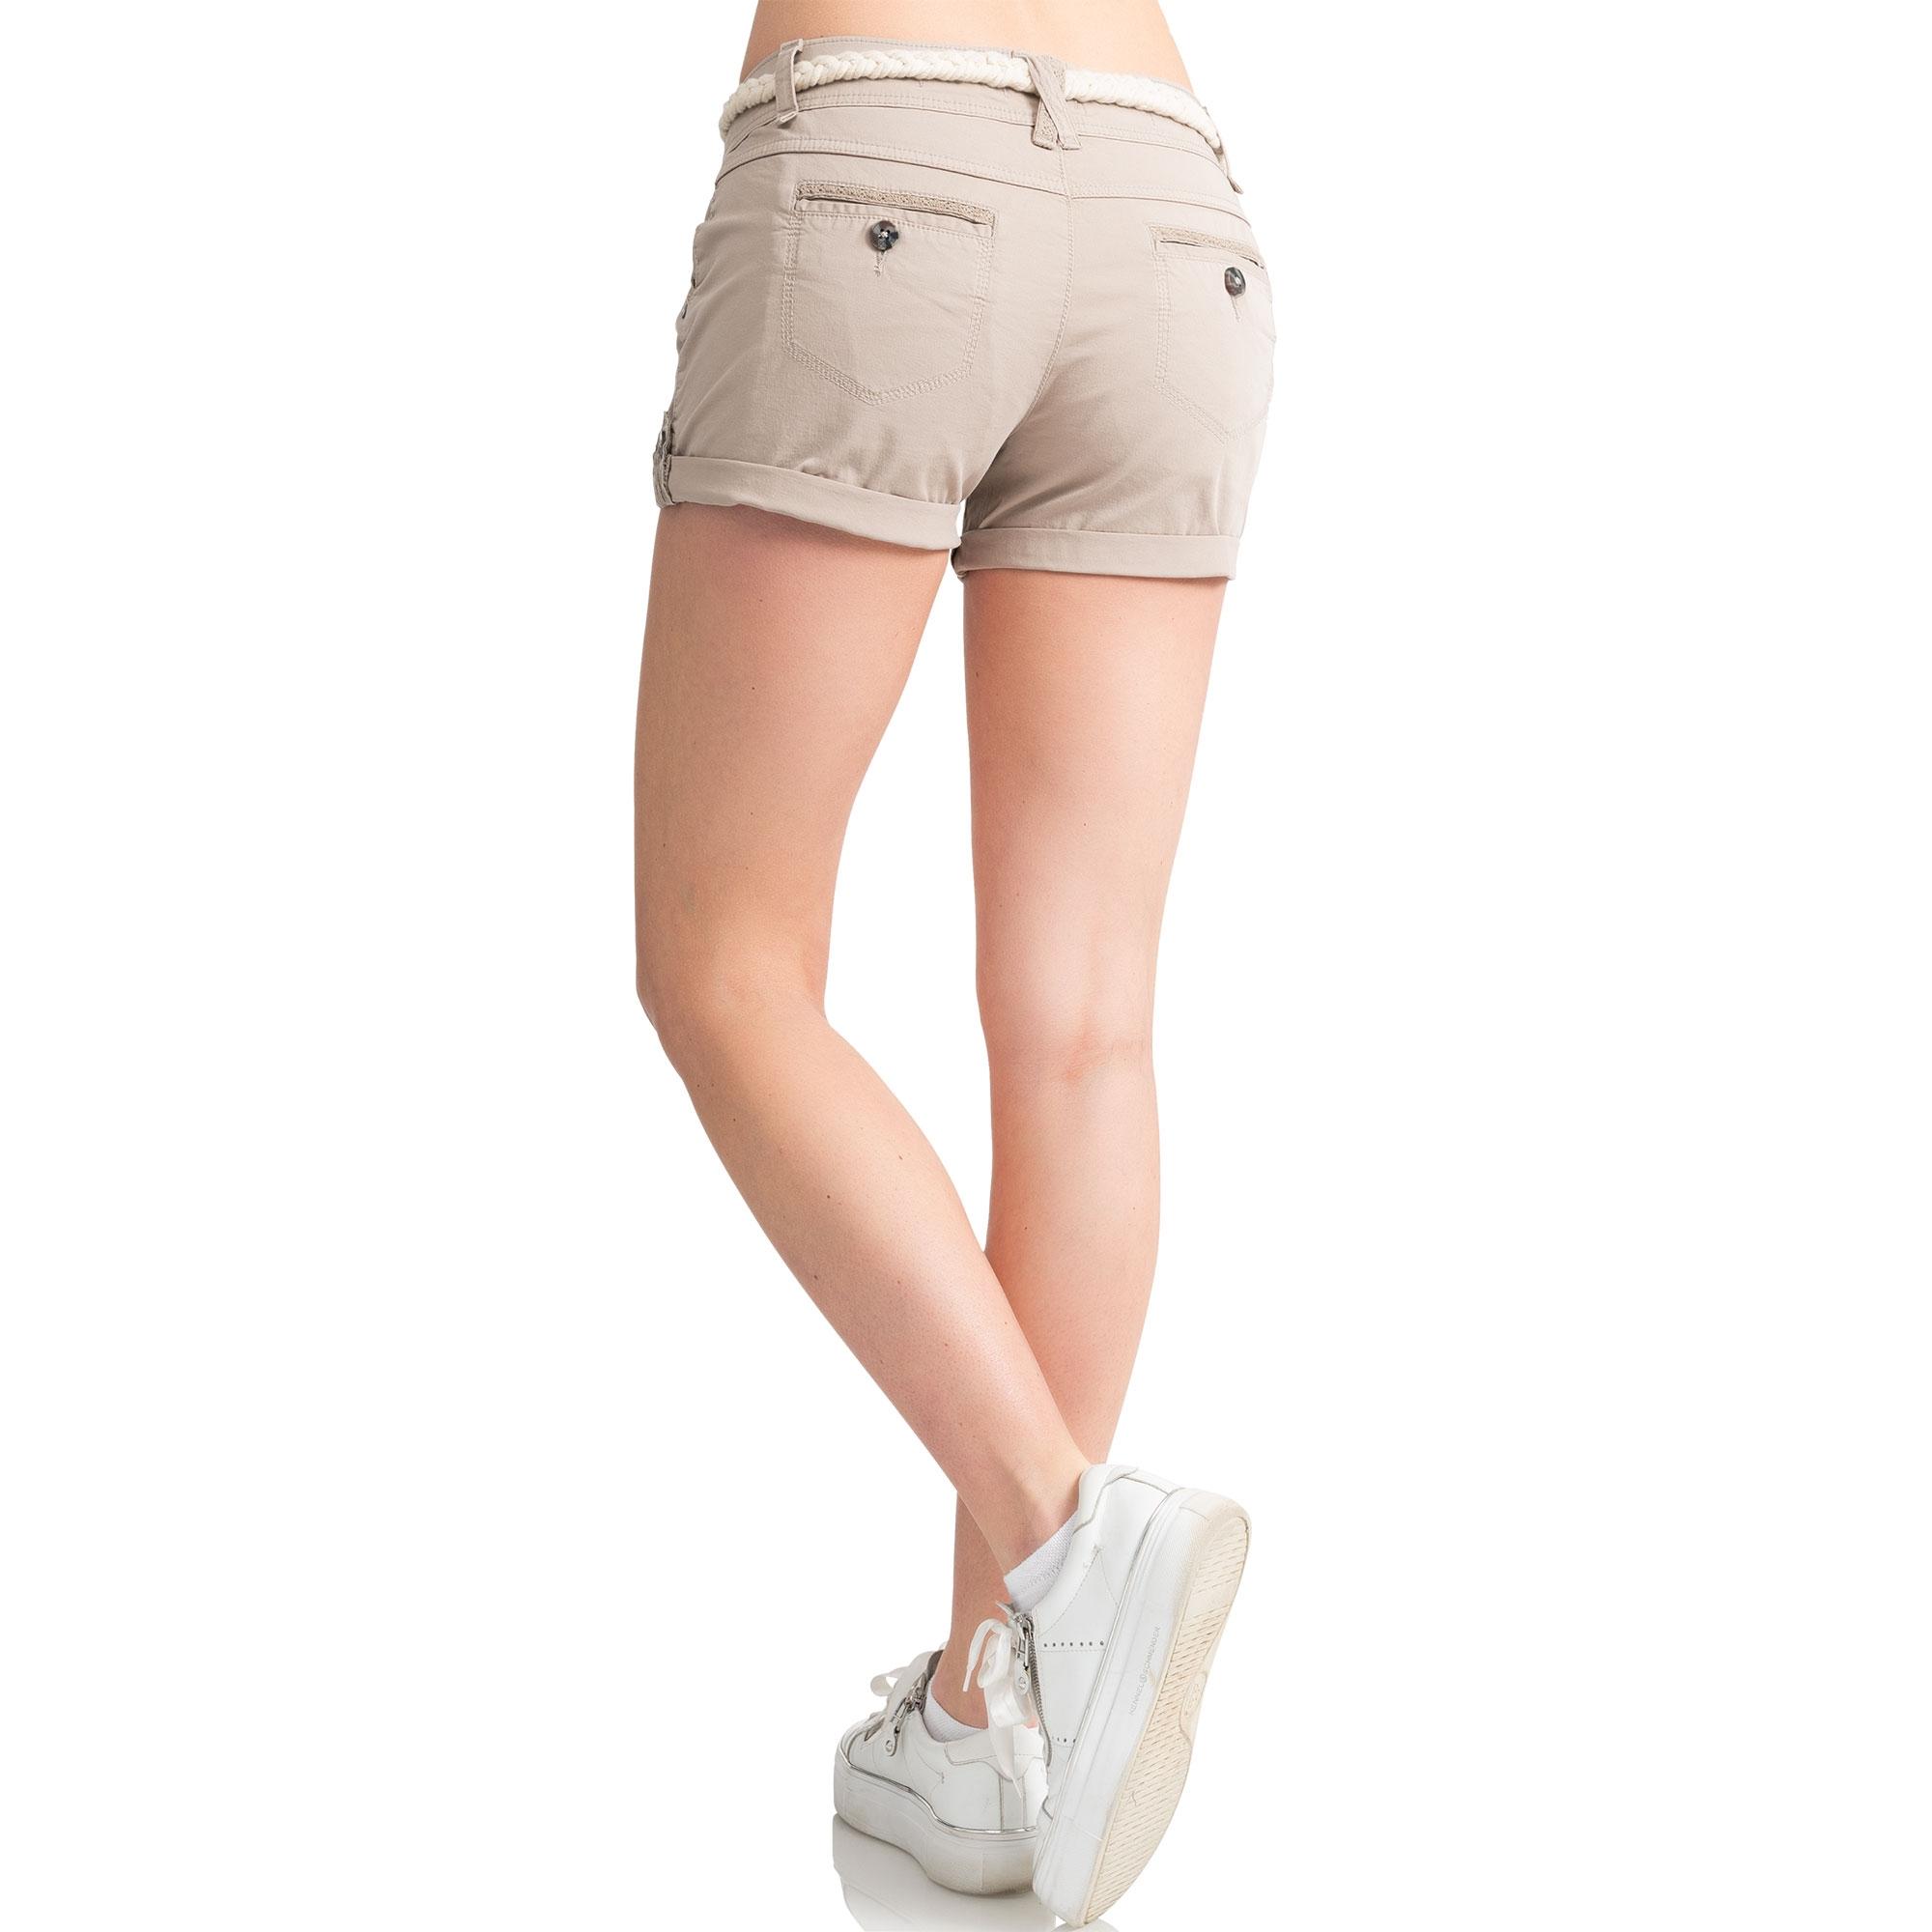 Indexbild 28 - Eight2Nine Damen Chino Bermuda Stretch Shorts mit Flecht Gürtel Hotpants